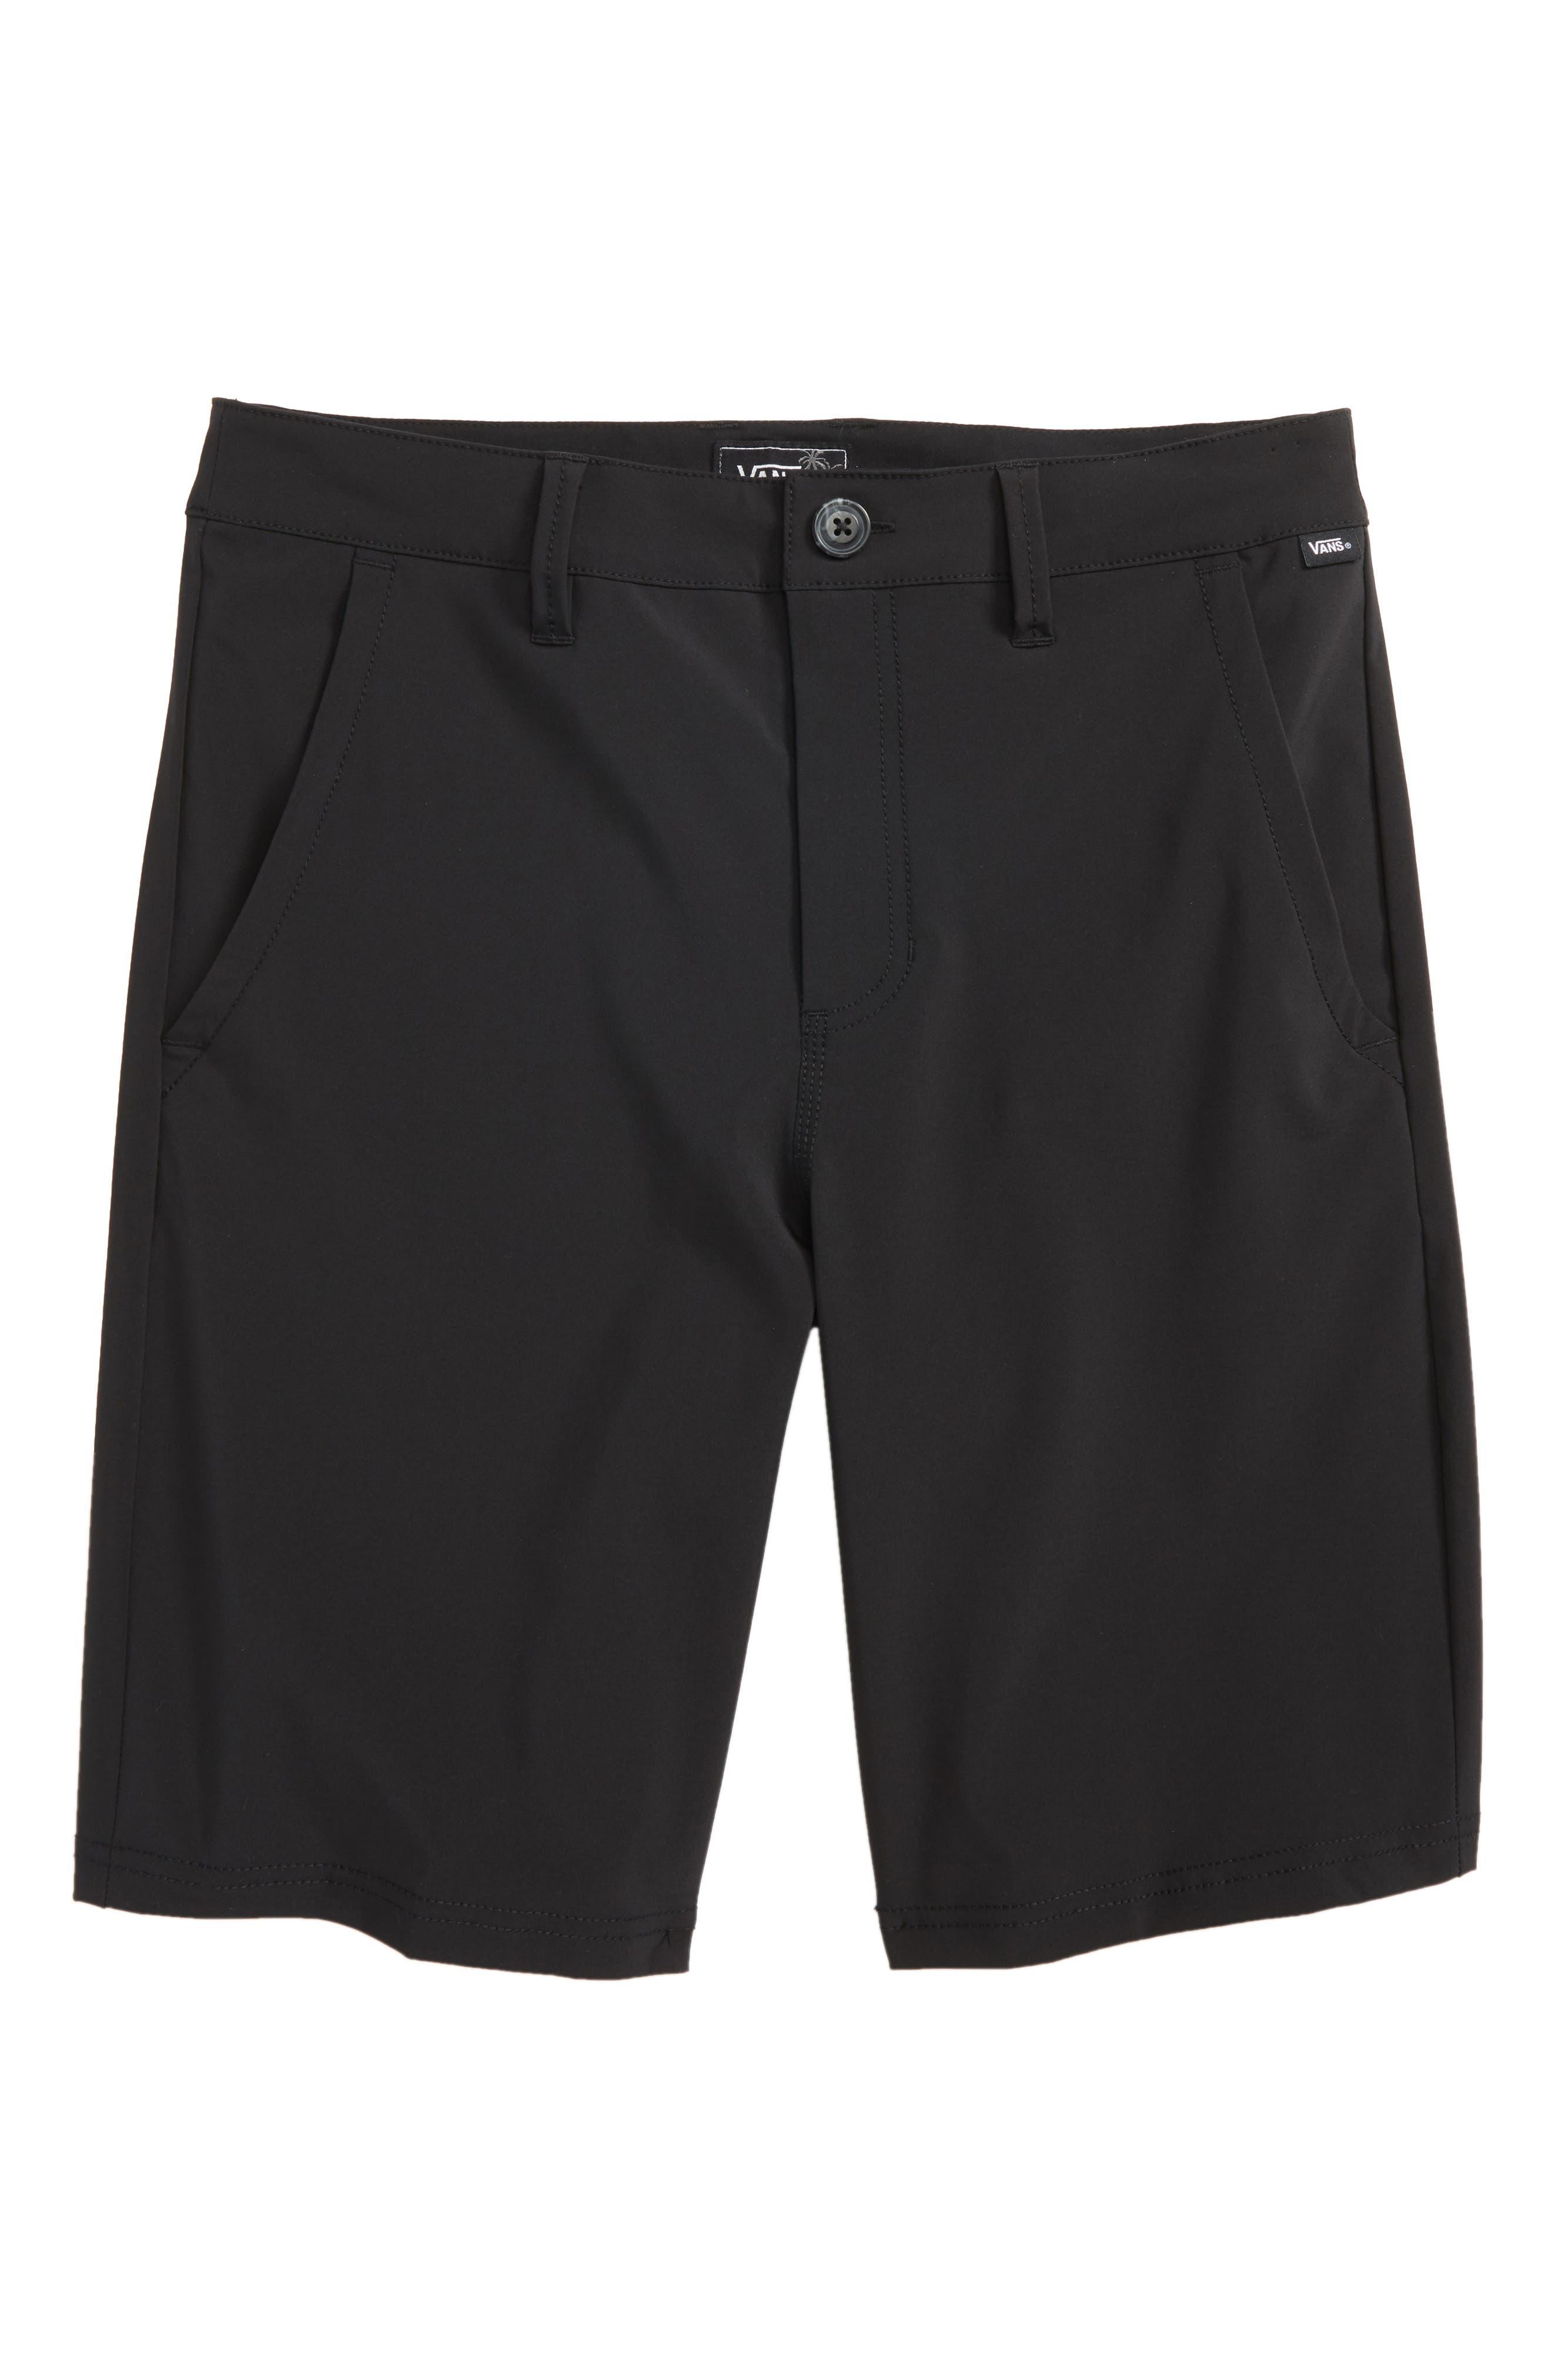 Authentic Decksider Hybrid Shorts,                             Main thumbnail 1, color,